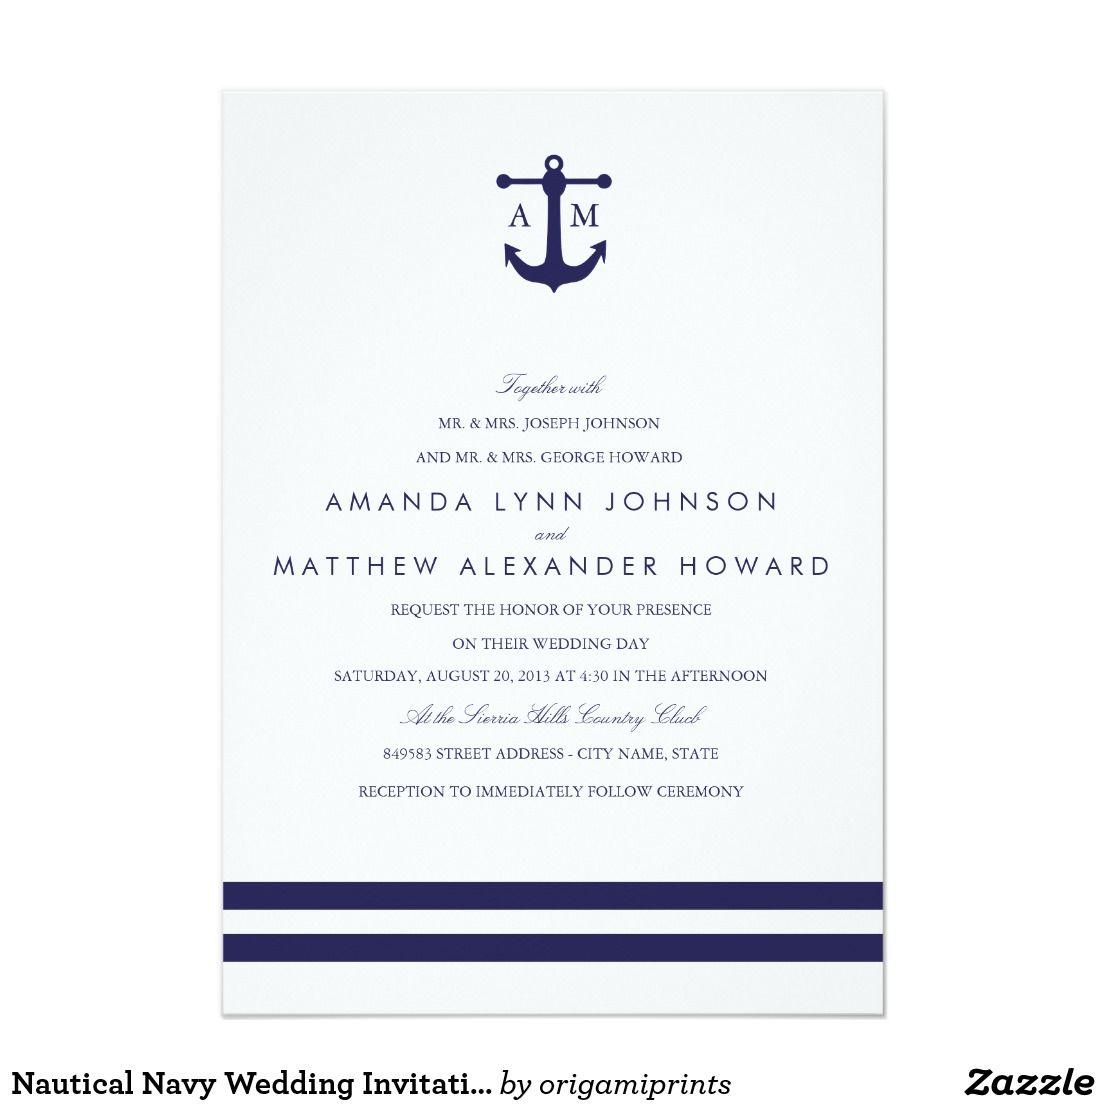 Nautical Navy Wedding Invitation   Wedding : Nautical   Pinterest ...